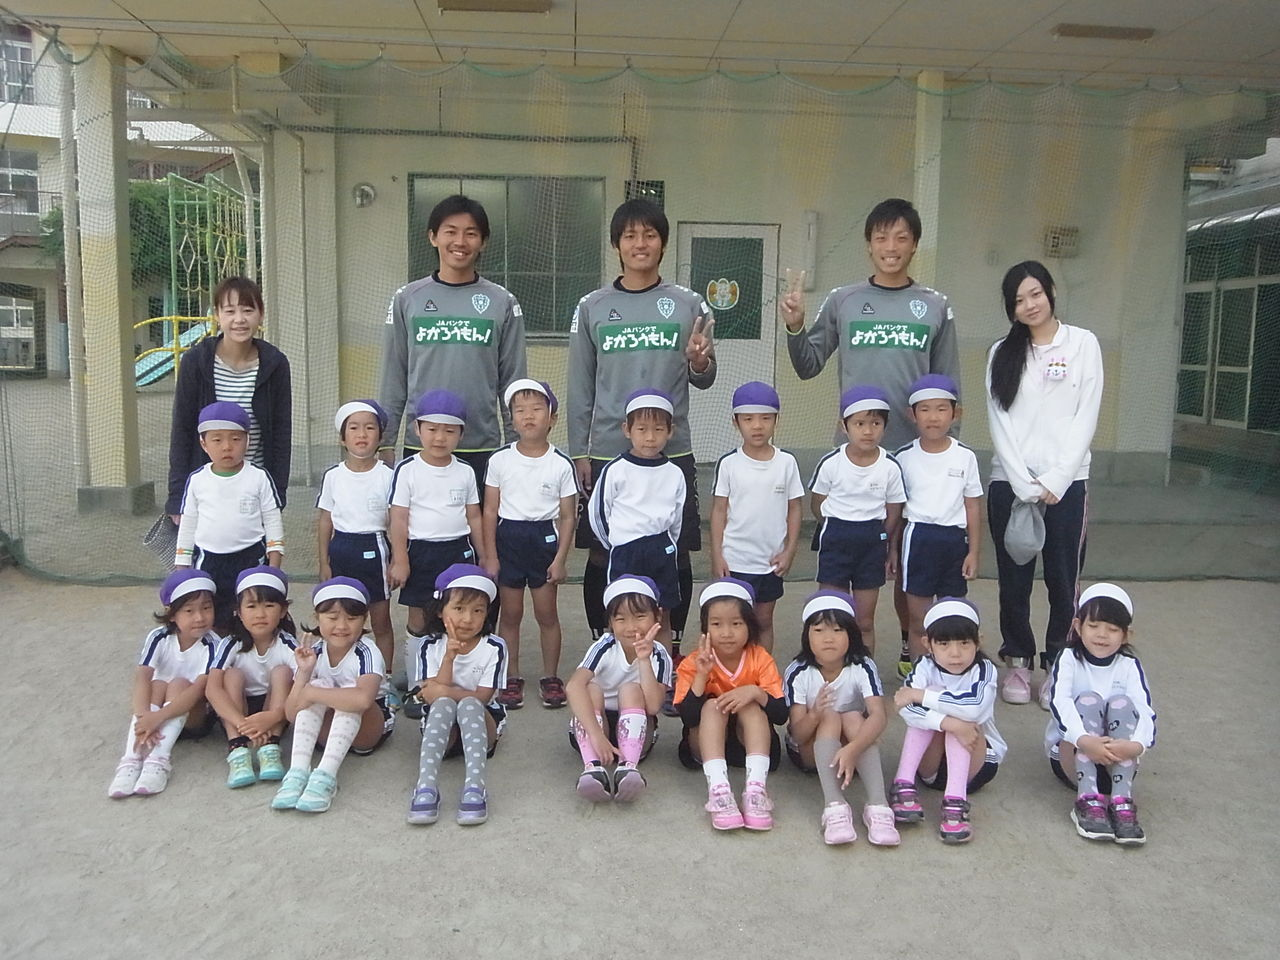 幼稚園 高取